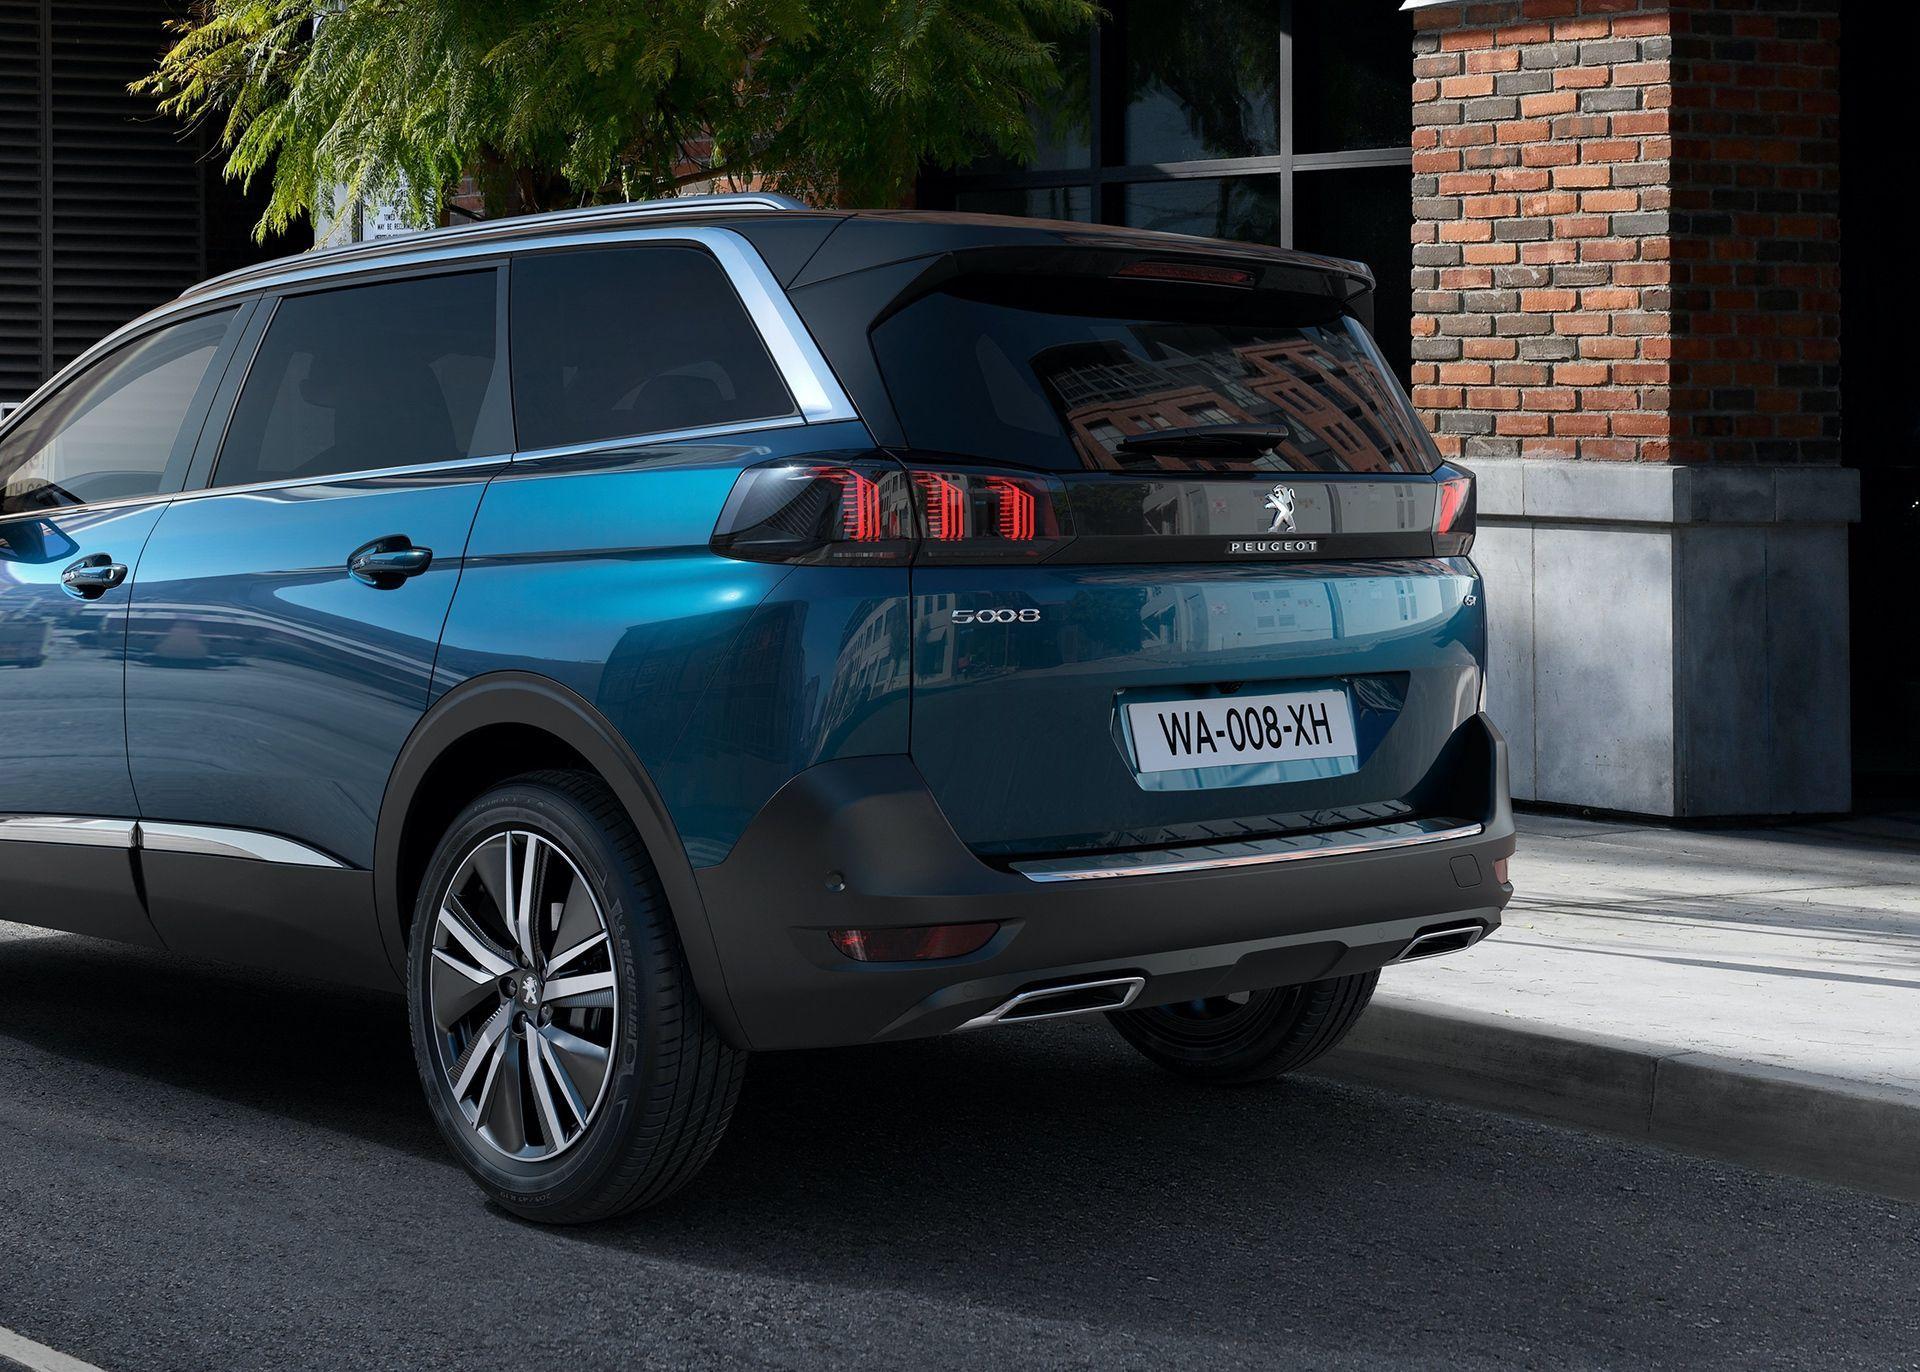 Peugeot_5008_facelift_0015